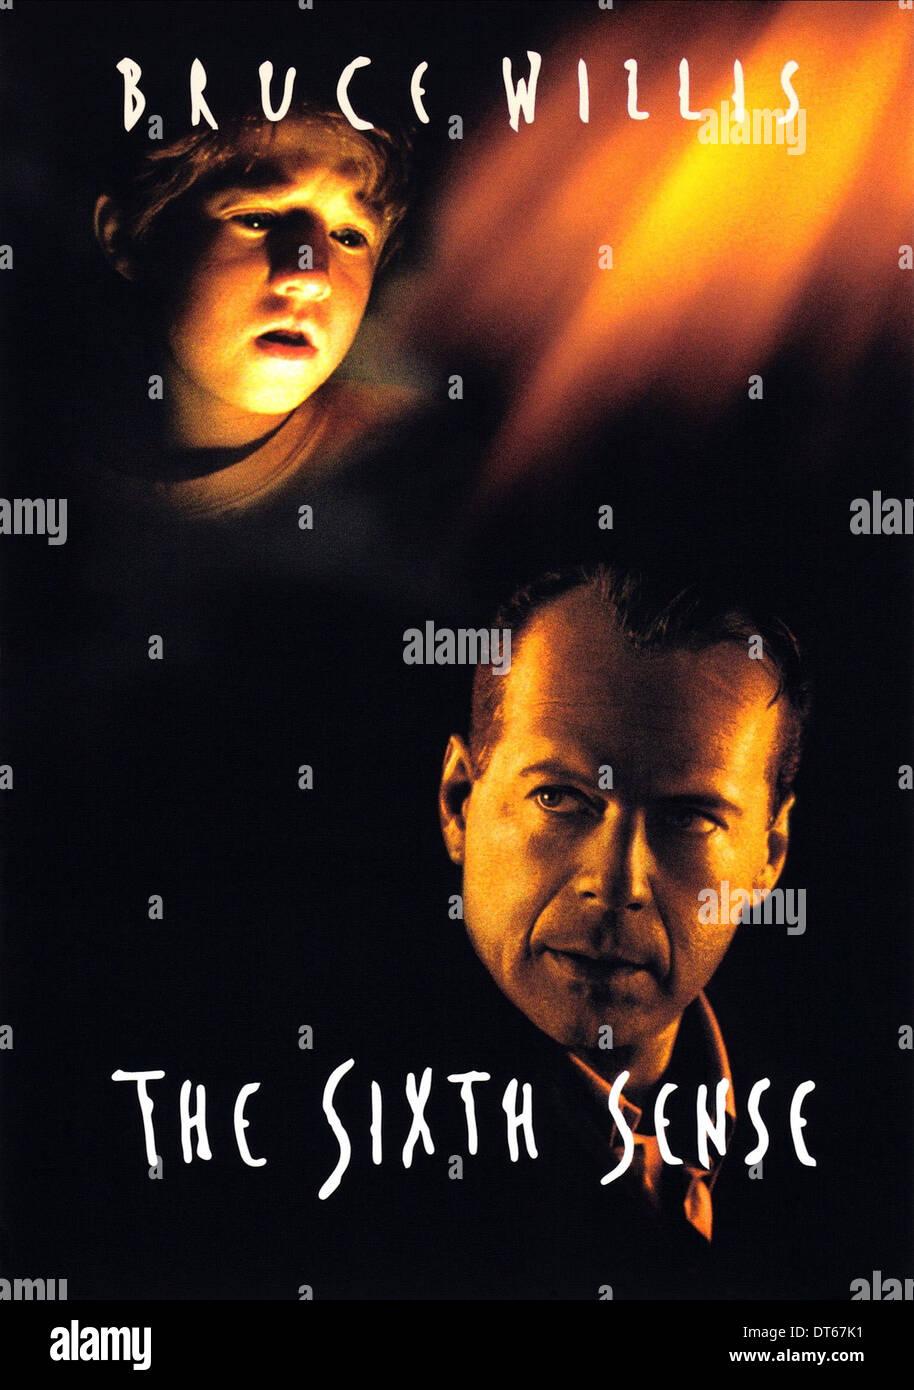 Haley Joel Osment Bruce Willis The Sixth Sense 1999 Stock Photo Alamy